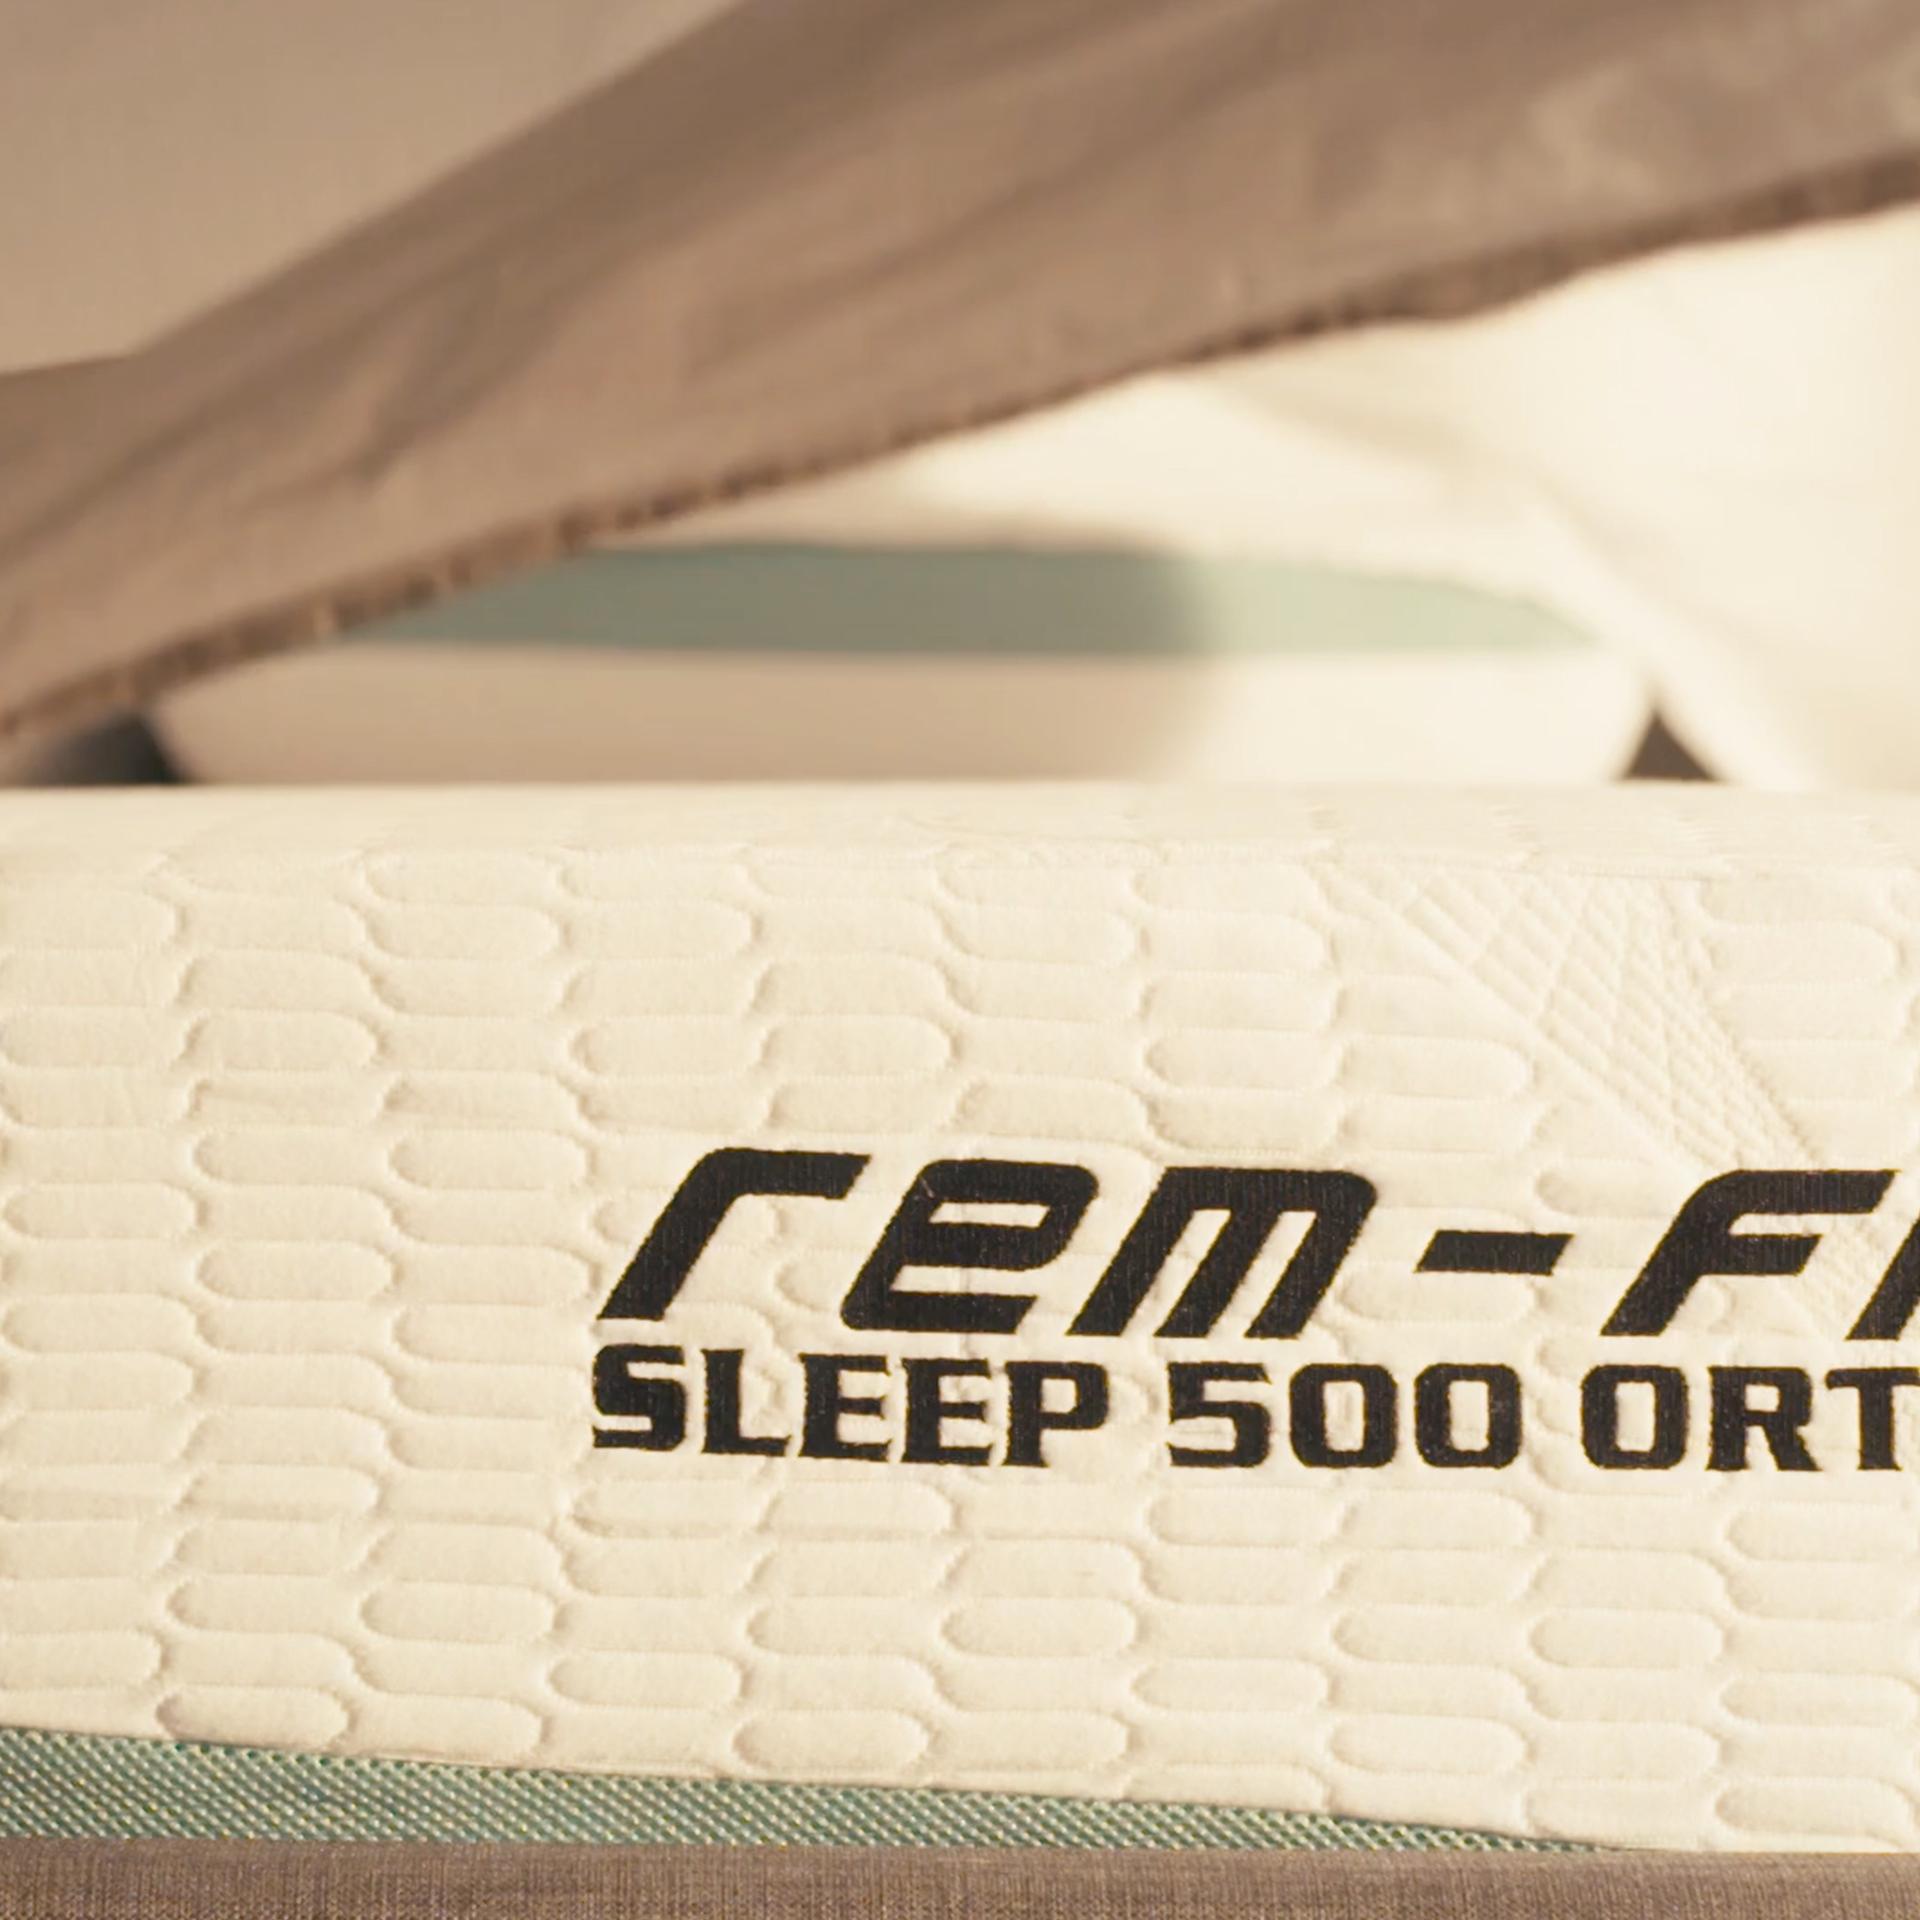 Bed sheet landing on mattress